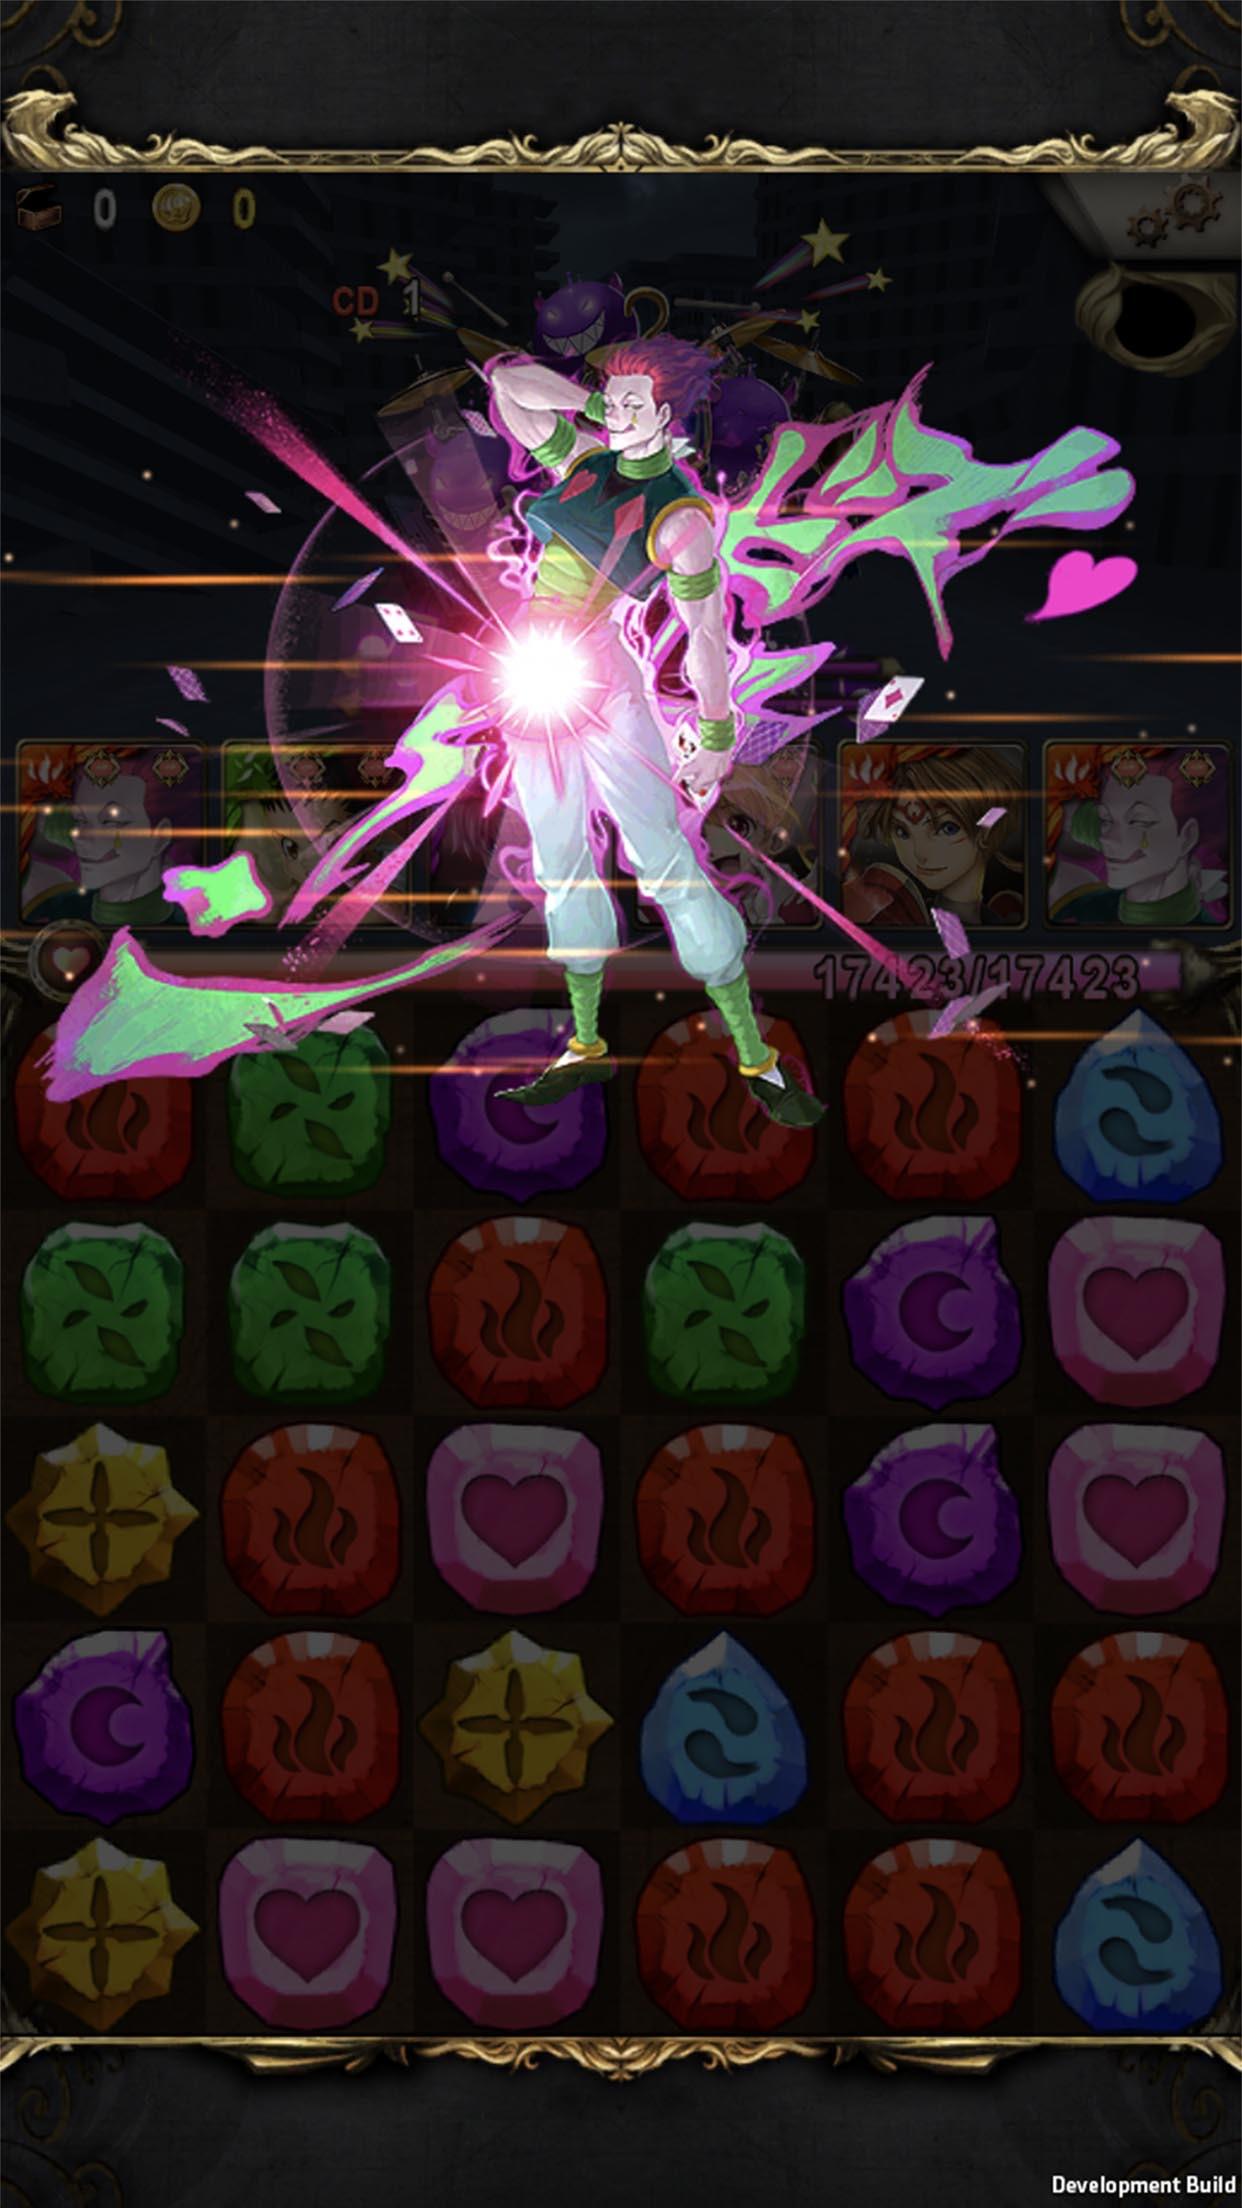 神魔之塔 - Tower of Saviors Screenshot